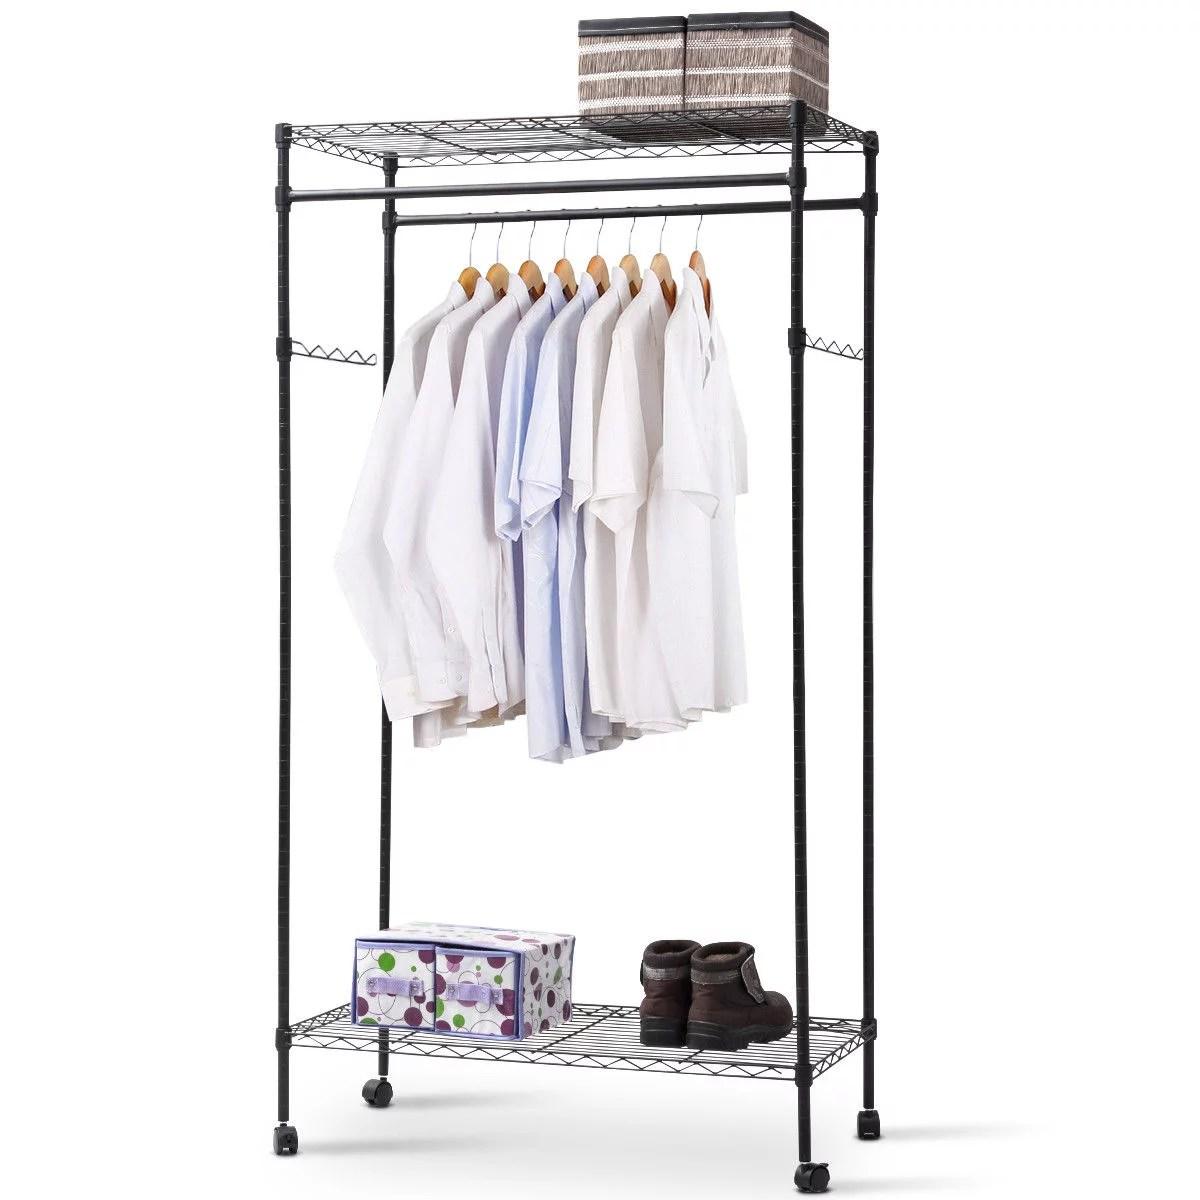 costway garment rack double hanging clothes rail rolling adjustable rod portable shelf